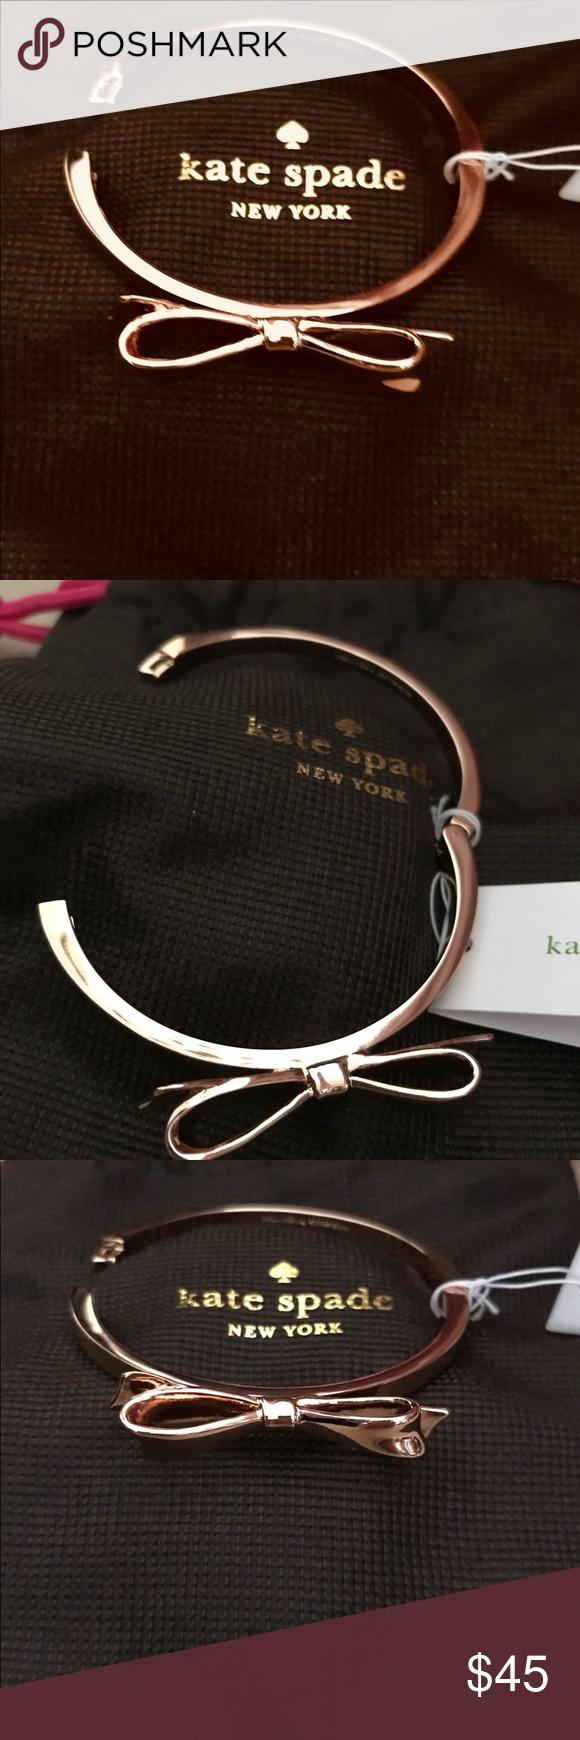 Nwot kate spade rose gold bow bracelet just in hinge opening rose